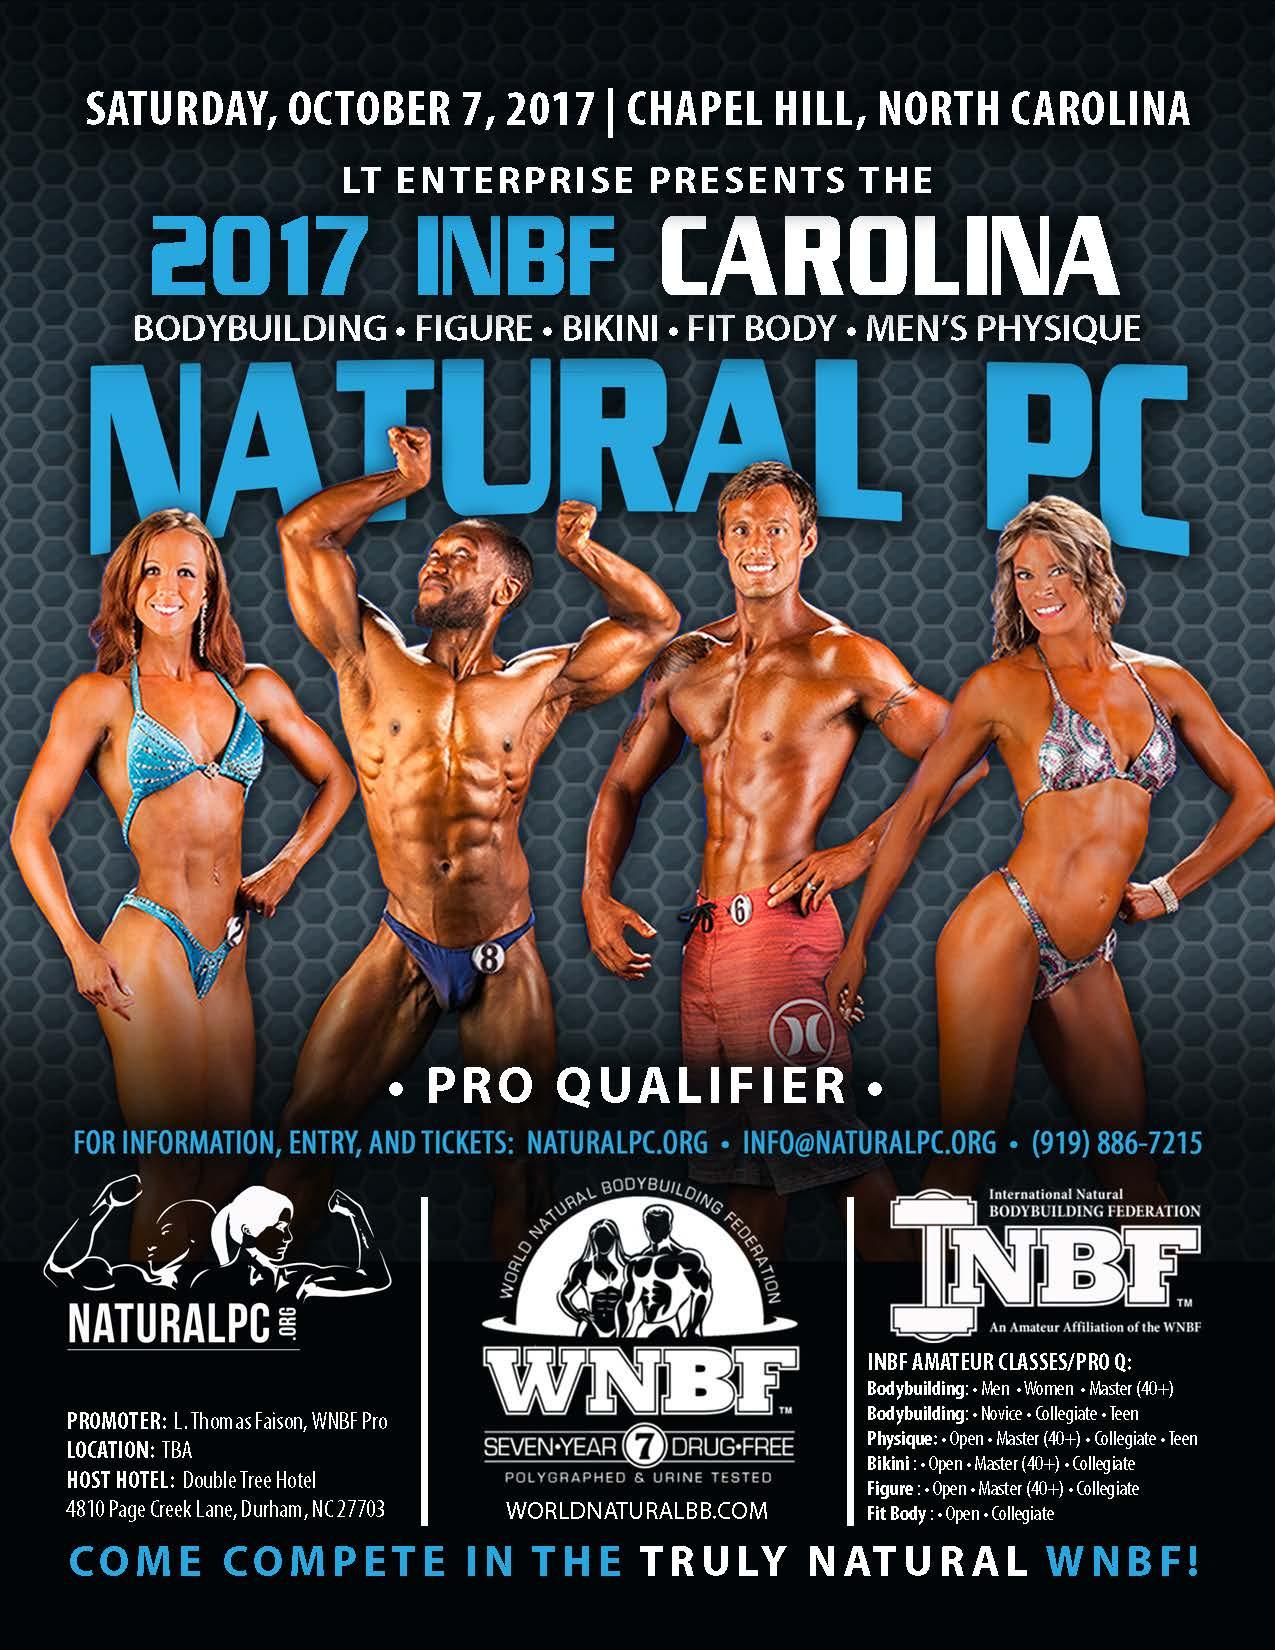 2017 INBF Carolina Natural PC WNBF Pro Qualifier